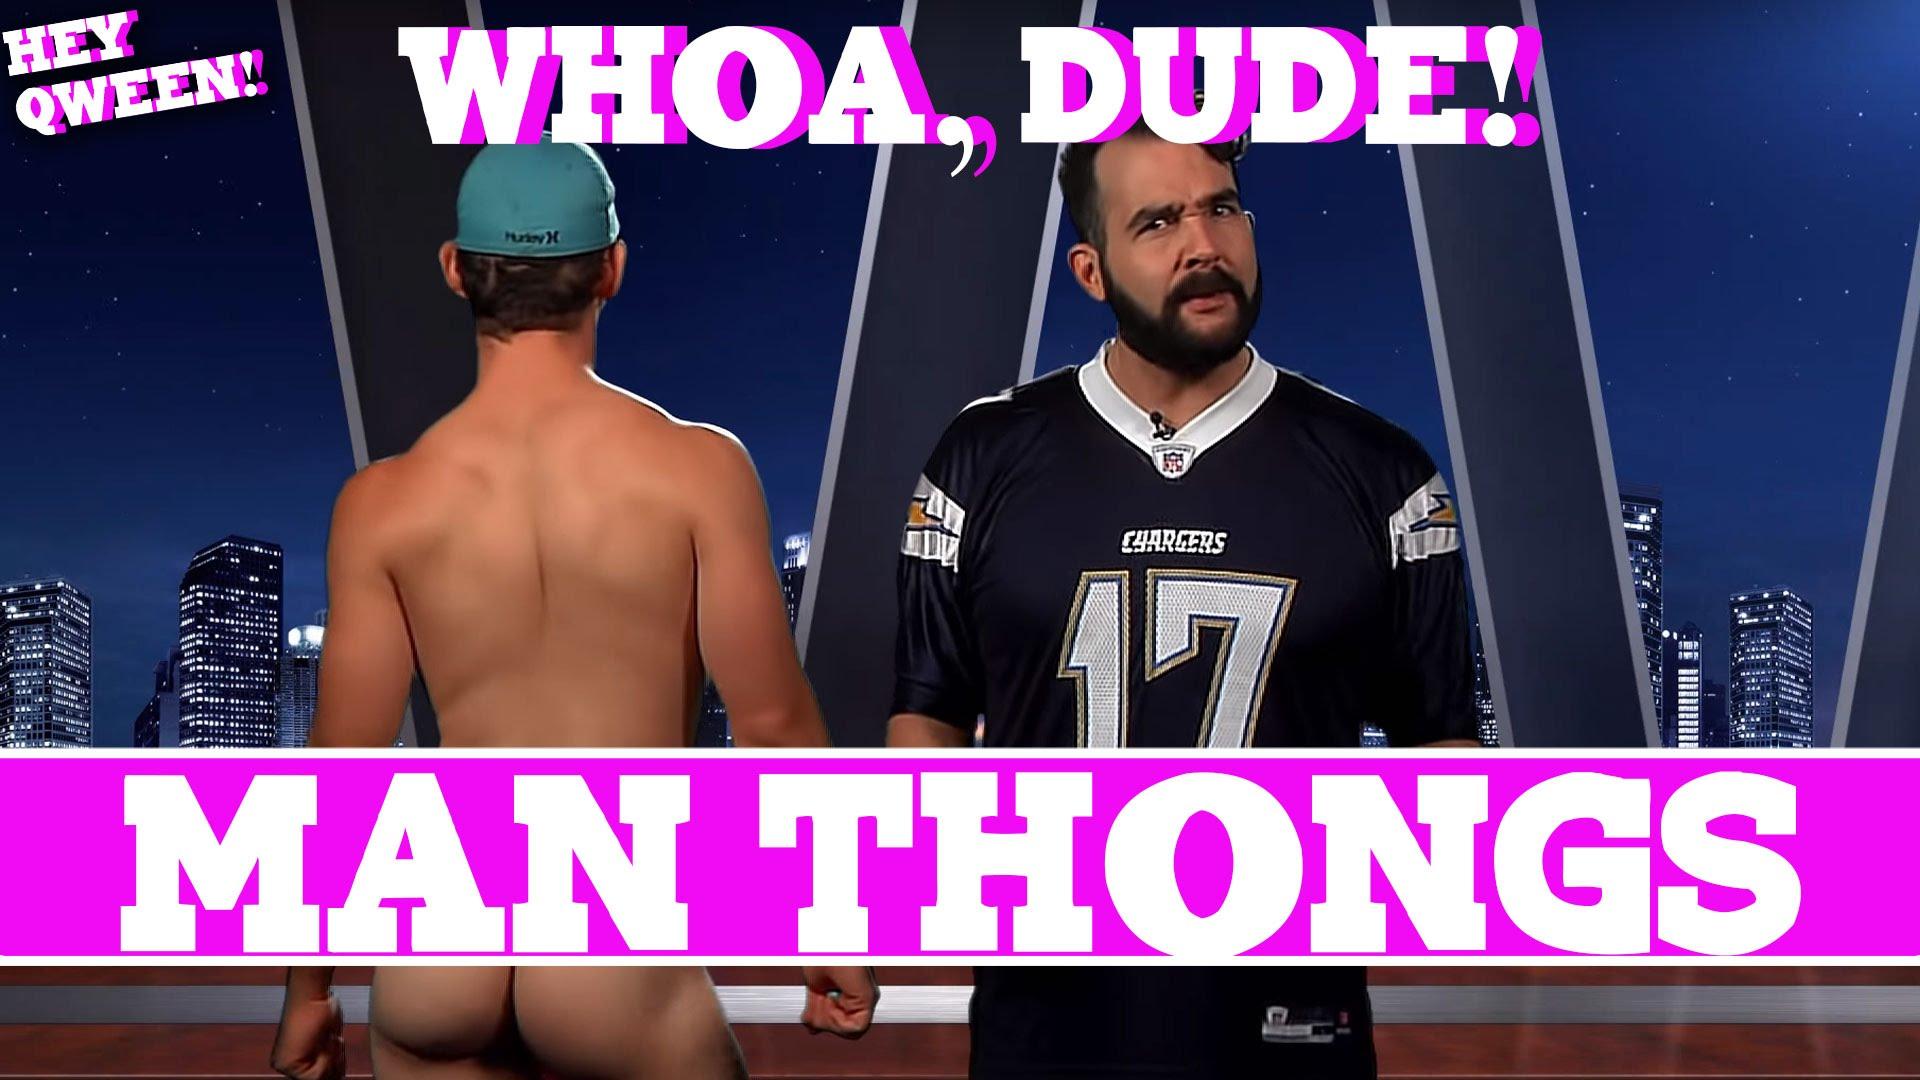 Whoa, Dude! Man Thongs, Episode 104